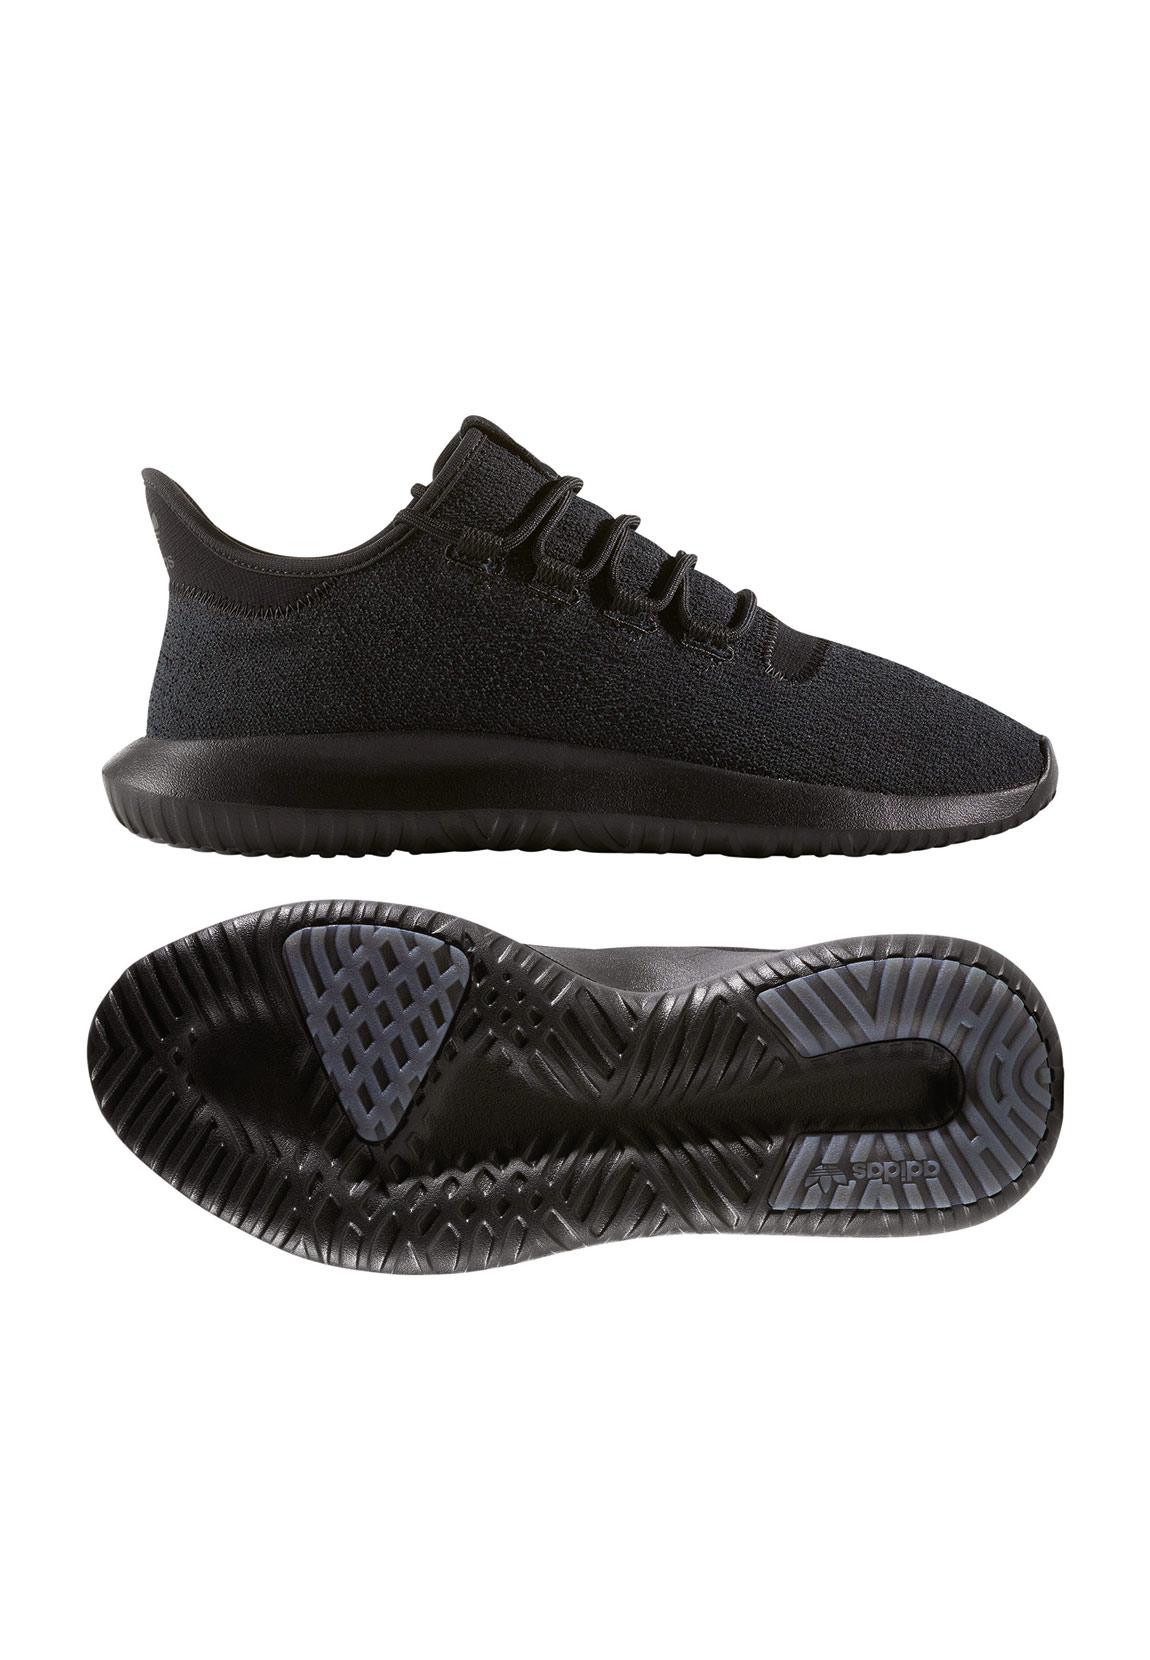 adidas sneaker herren tubular shadow by4392 schwarz schuhe herren. Black Bedroom Furniture Sets. Home Design Ideas